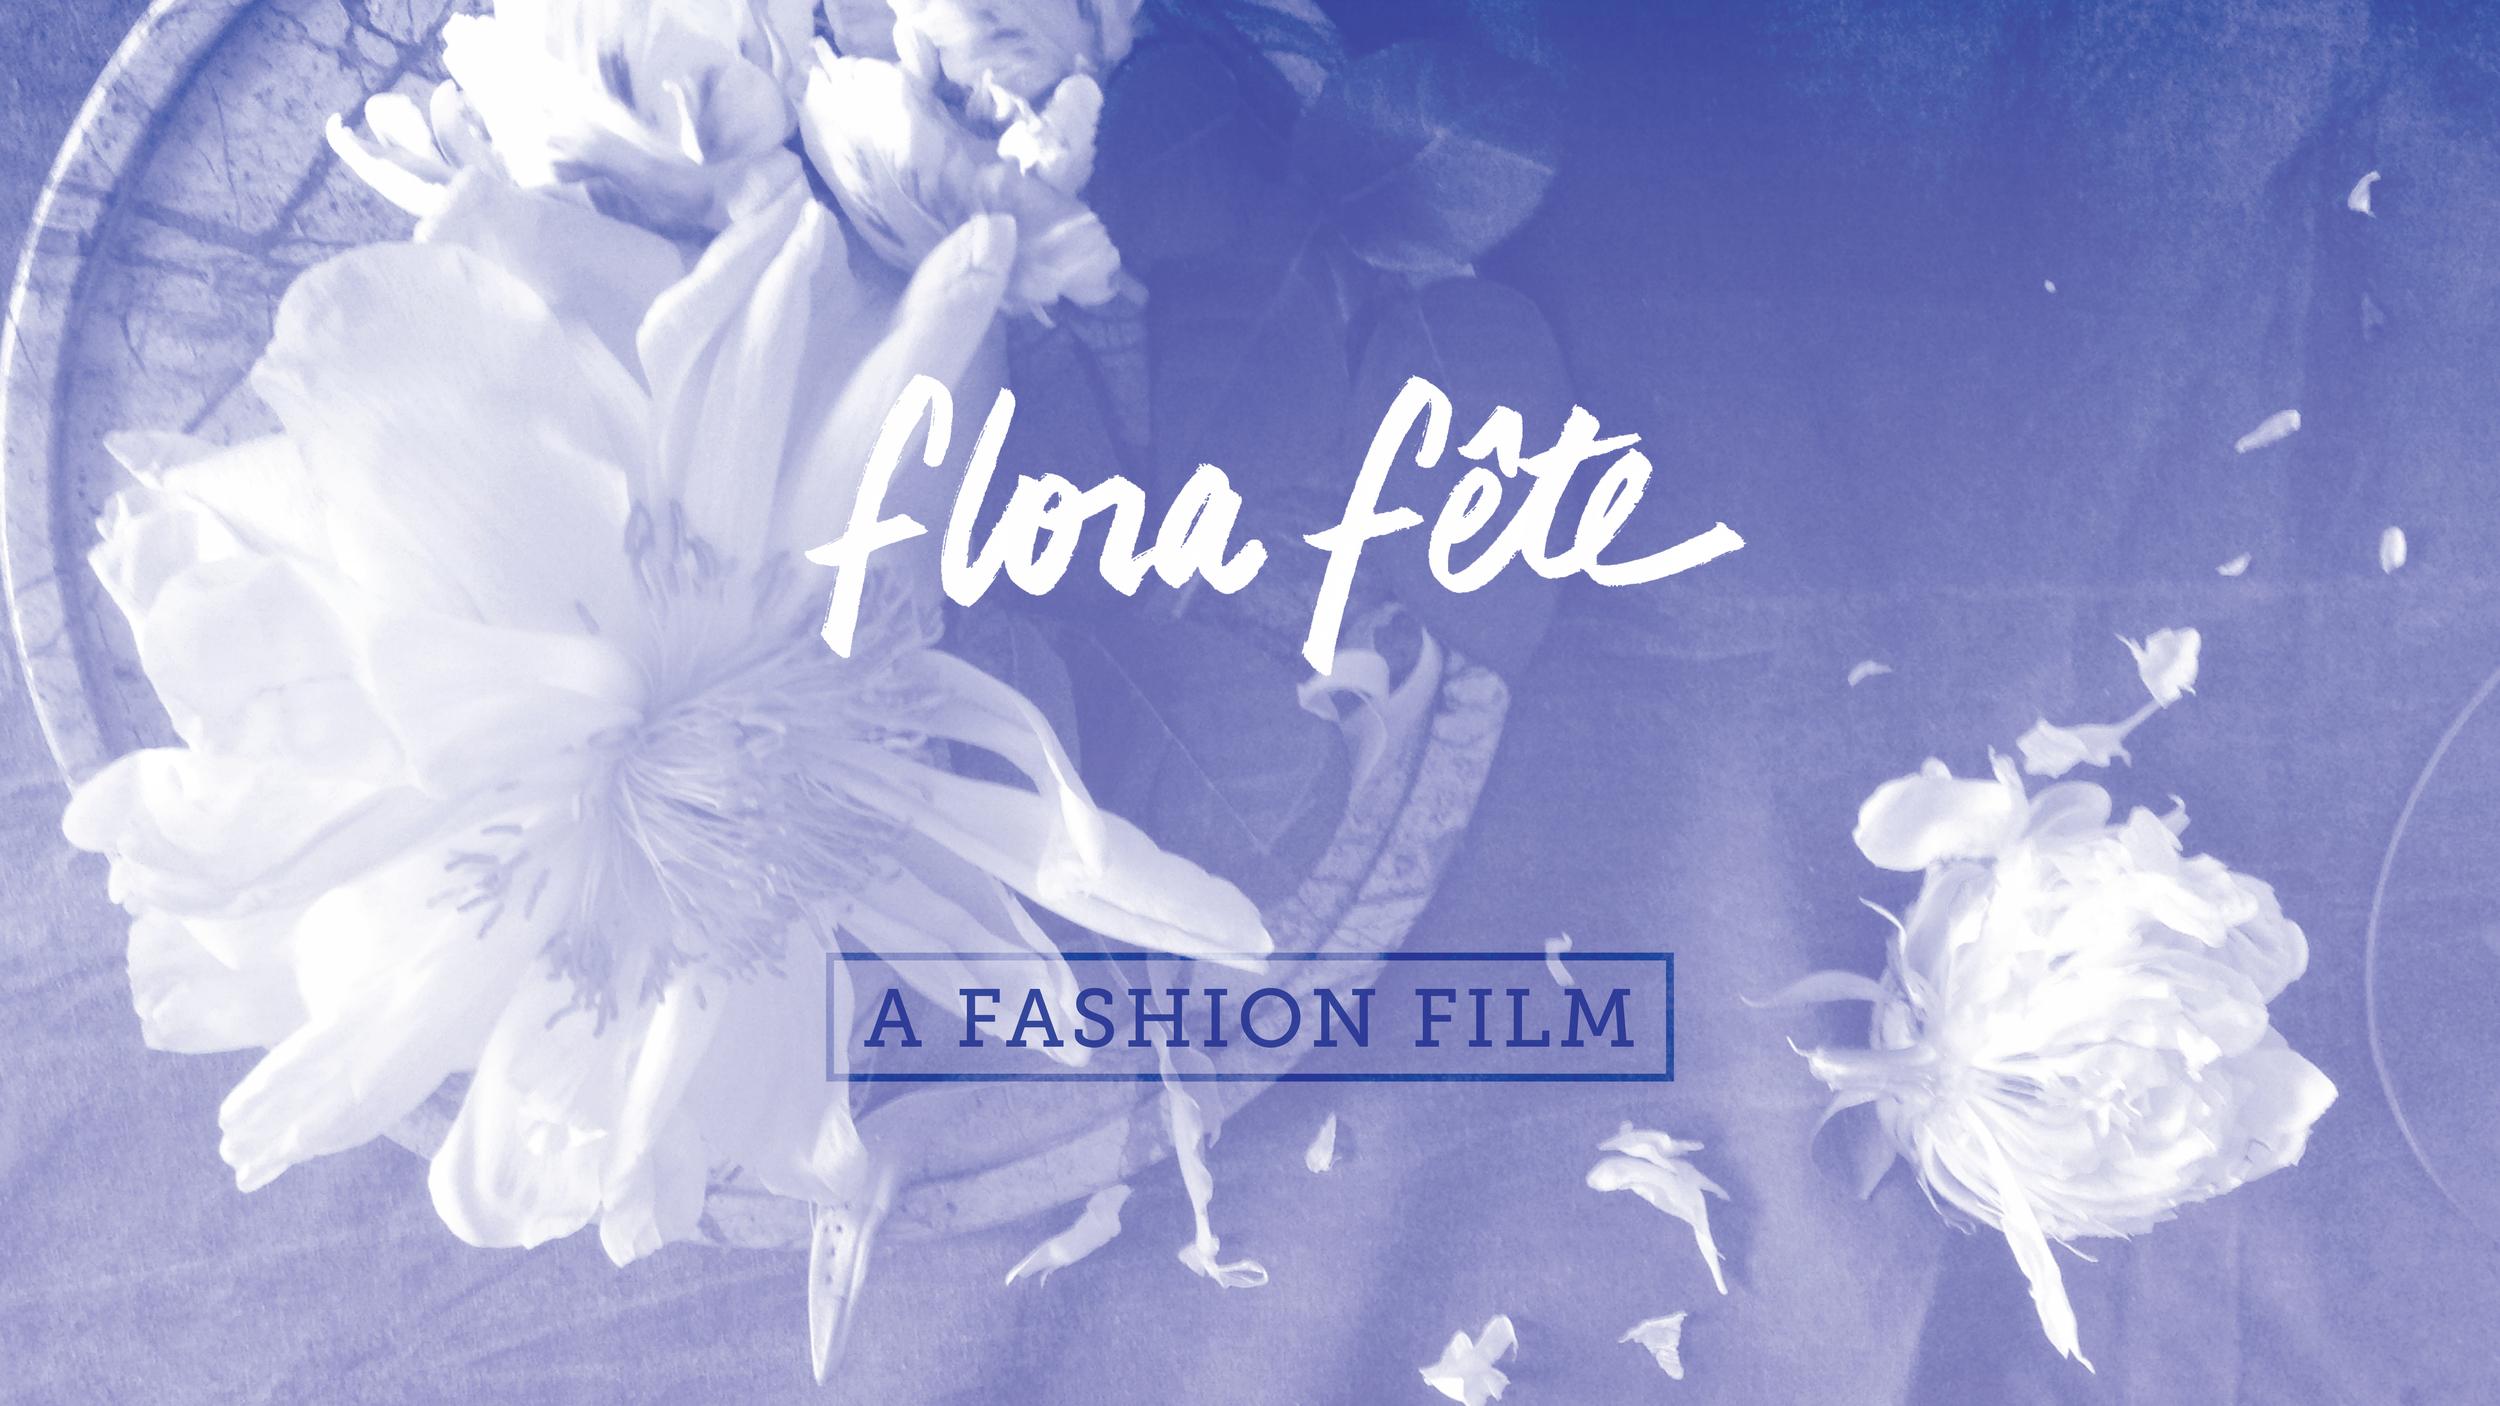 flora fete title card -a fashion film-01.jpg